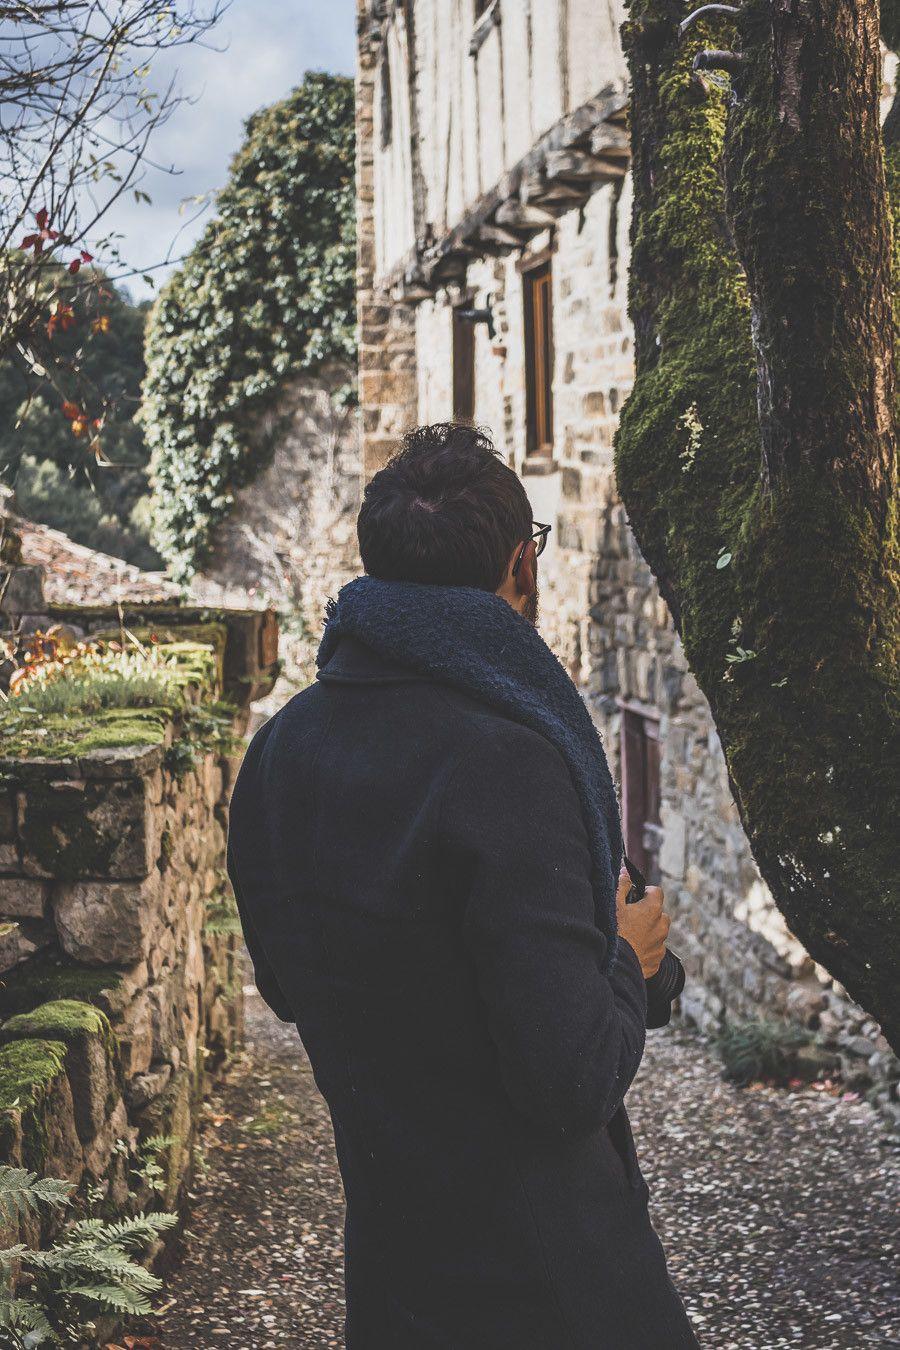 Village médiéval en Occitanie